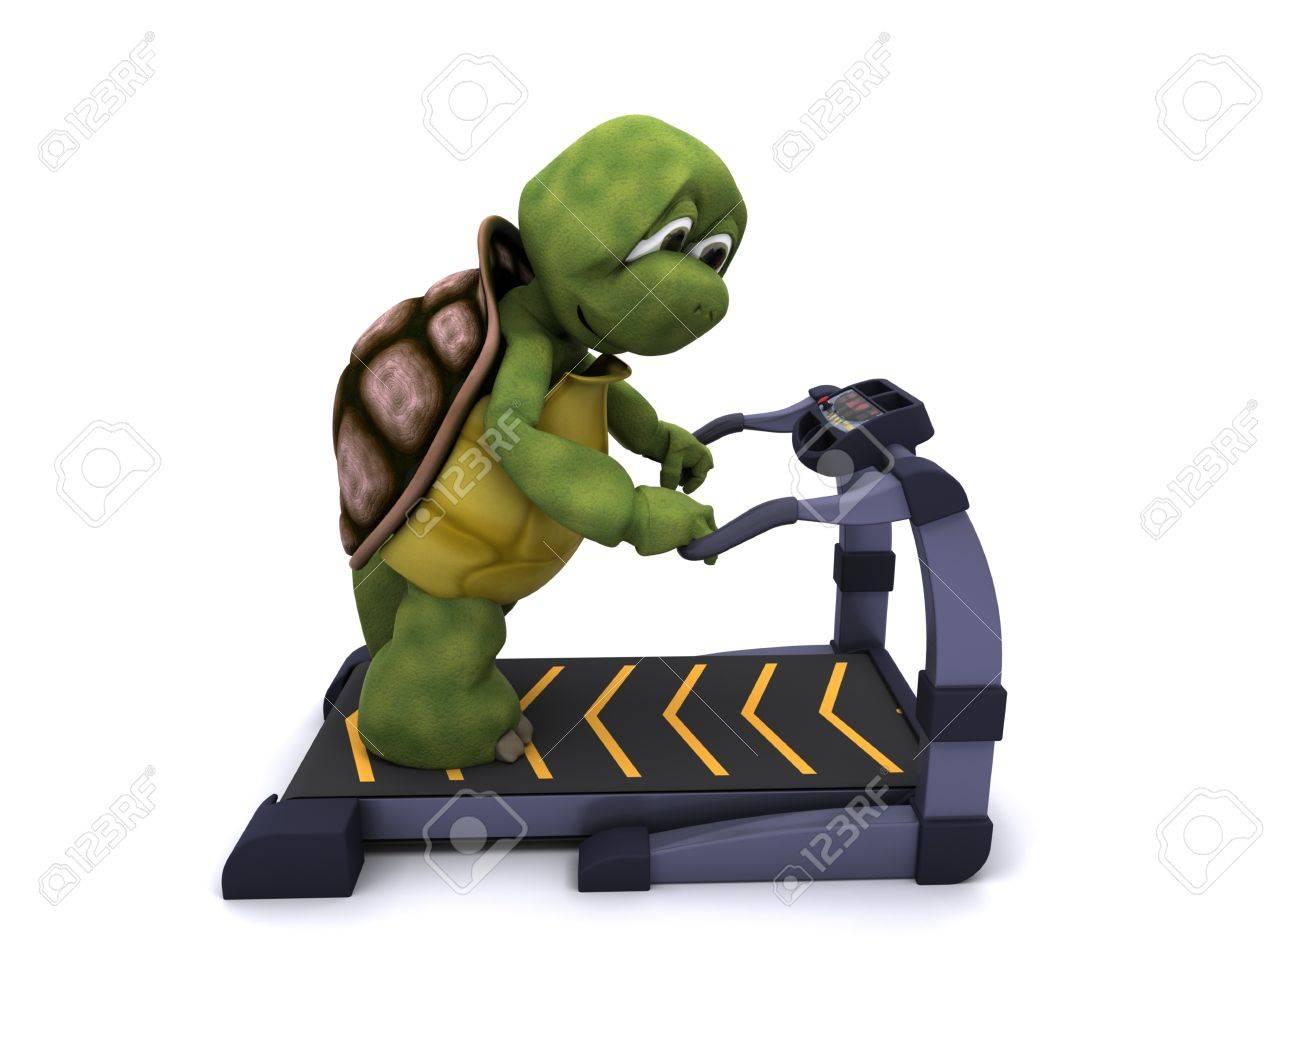 3D Render of a Tortoise running on treadmill Stock Photo - 11863033